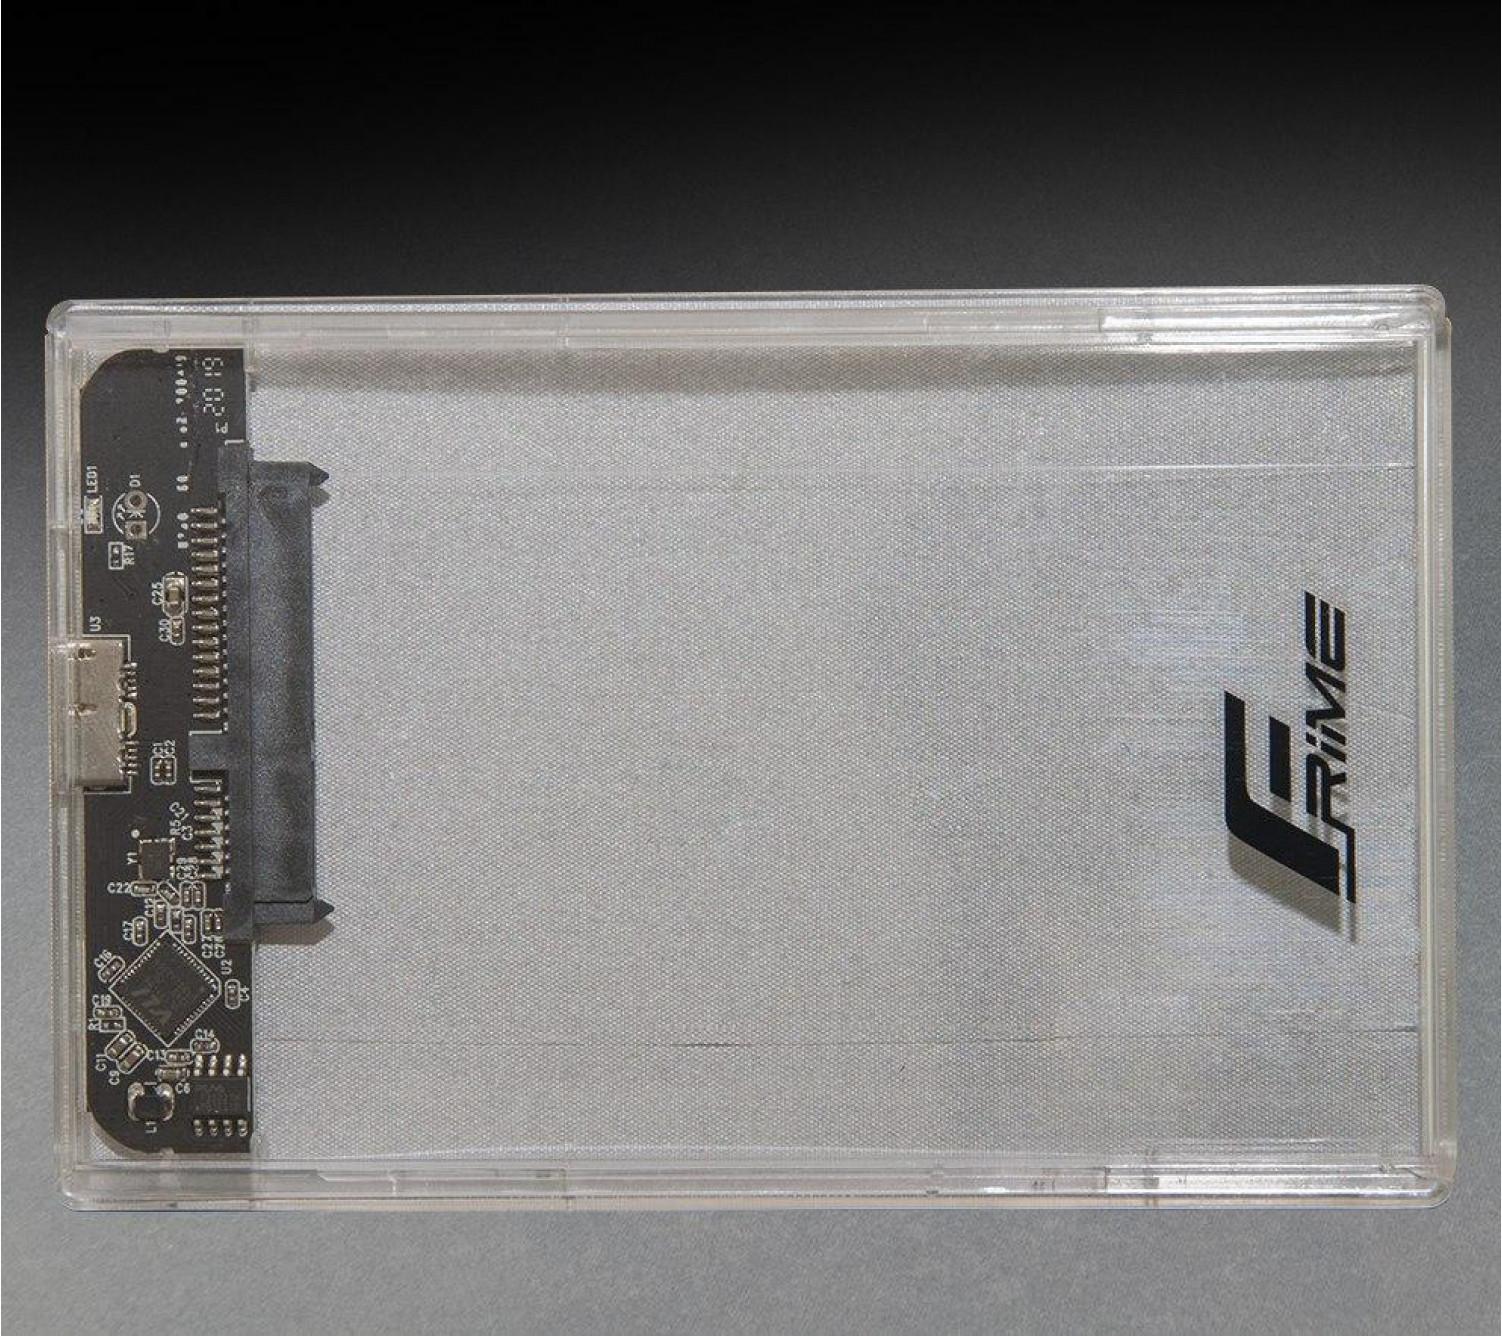 "Внешний карман Frime для 2.5 ""SATA HDD / SSD Plastic USB 3.0 Clear (FHE80.25U30)"